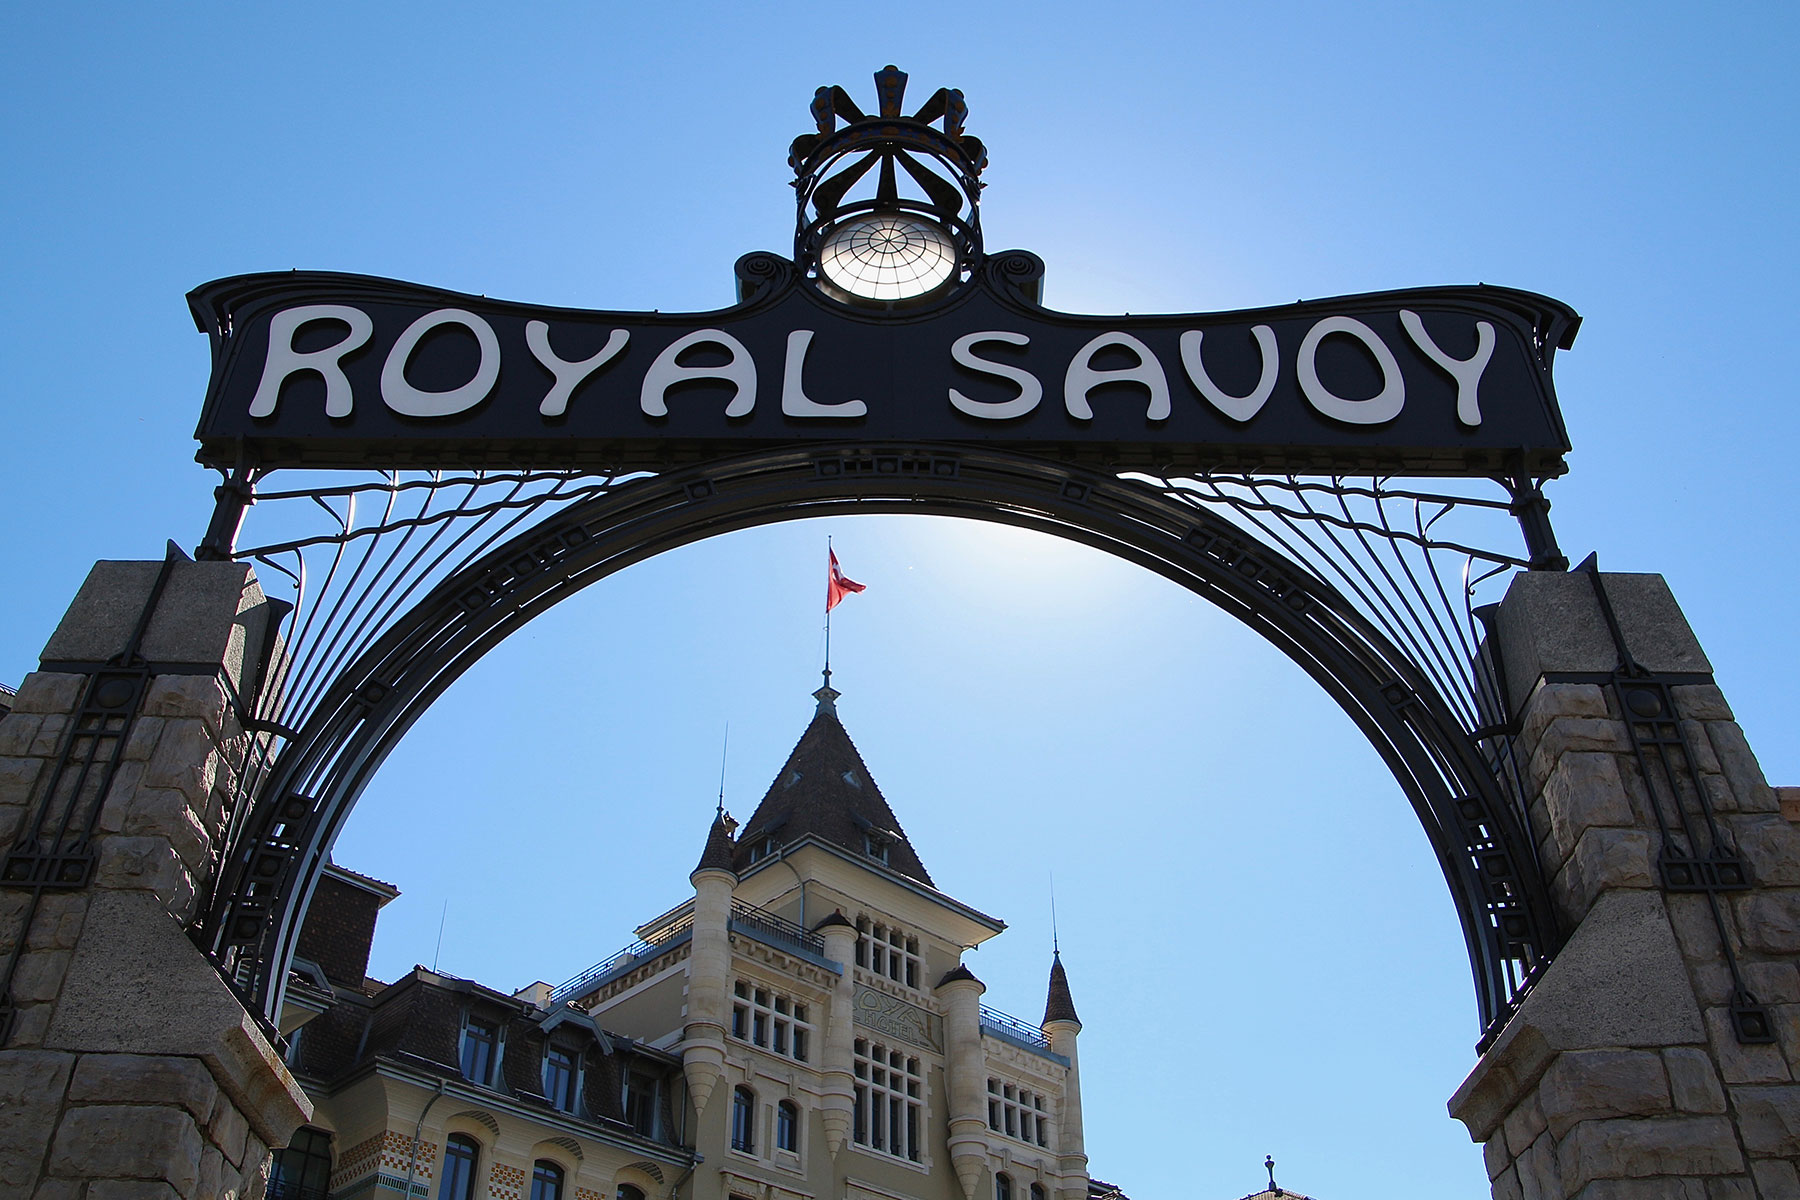 royal-savoy-inset-01